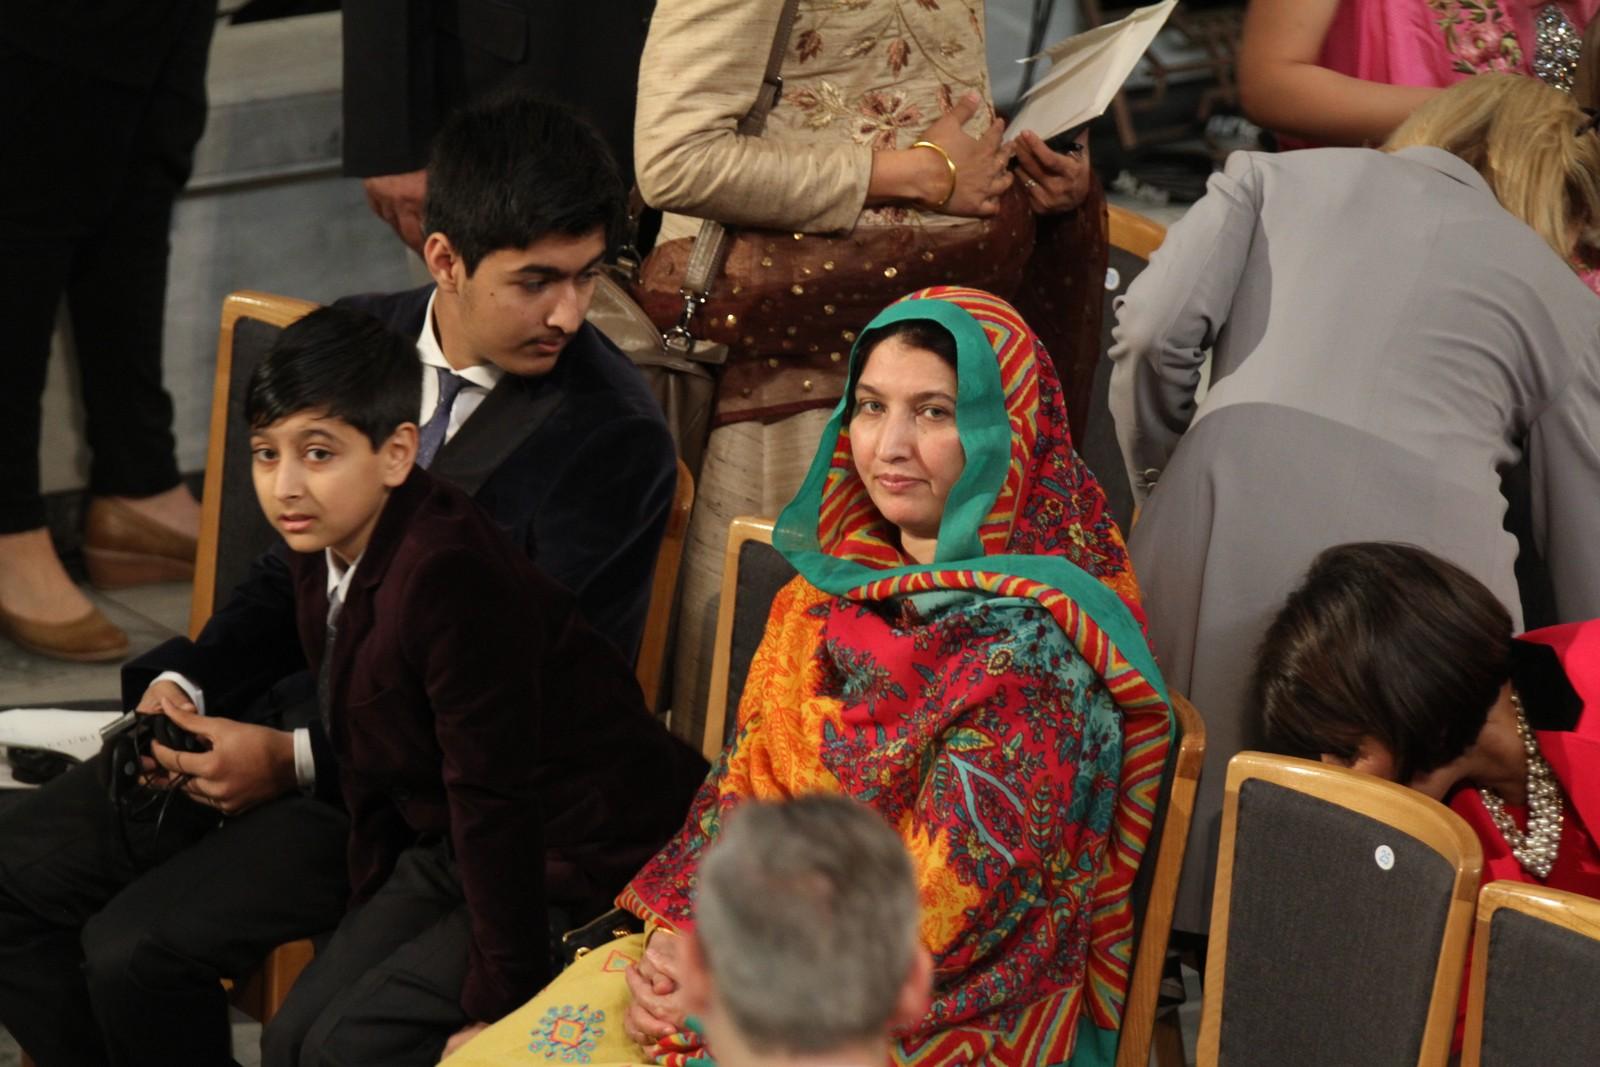 FAMILIE: Malalas mor Toor Pekai Yousafzai og brødrene Khusal Khan Yousafzai og Atal Khan Yousafzai i Oslo rådhus.